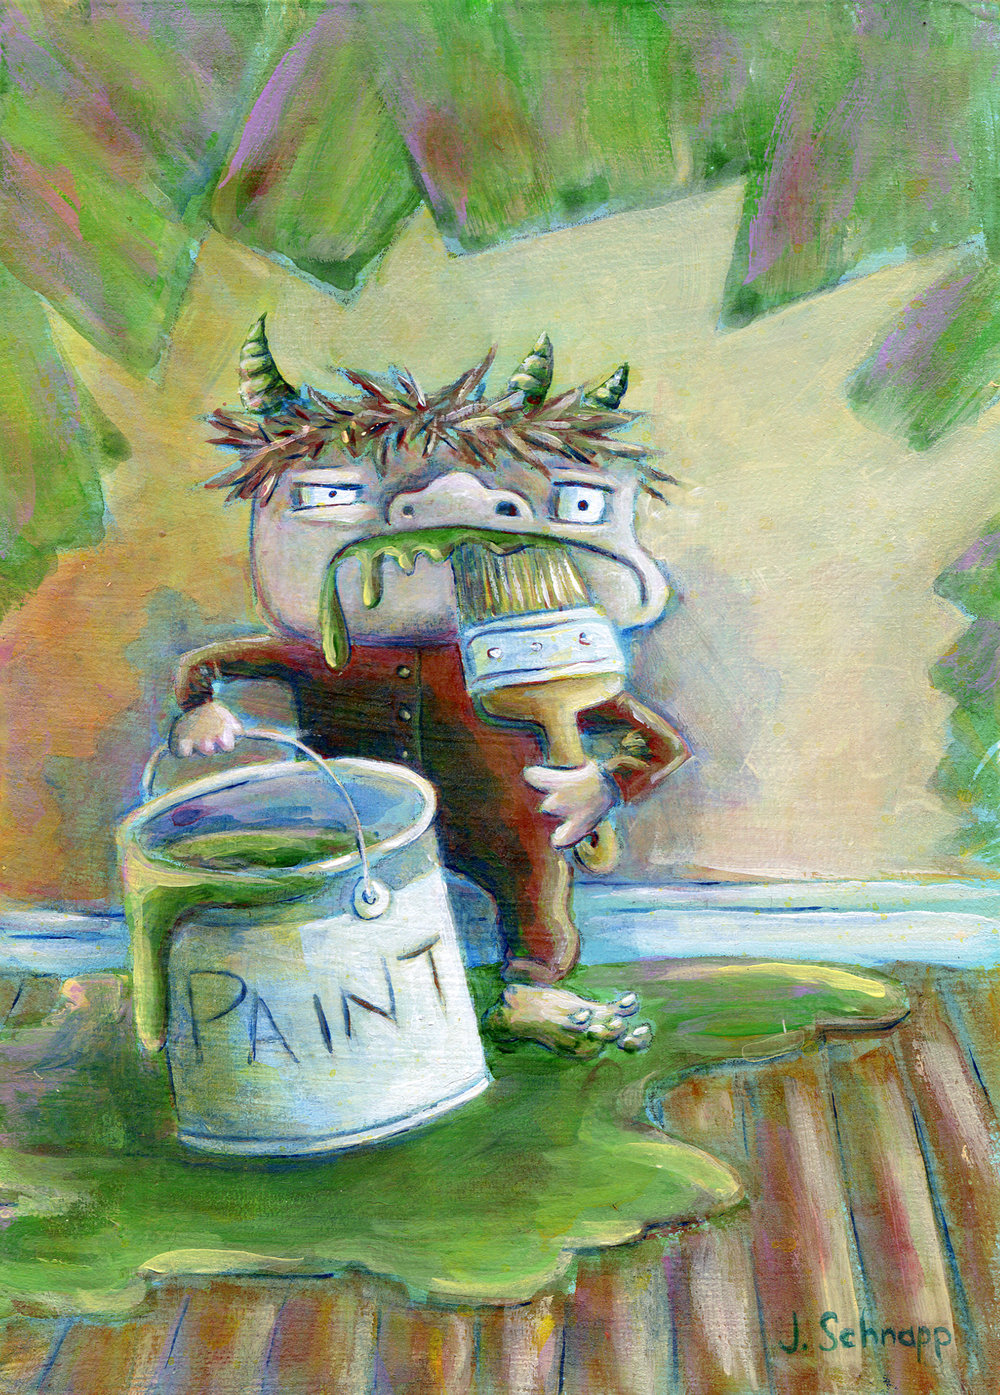 Paint Monster #2 by Jonathan Schnapp